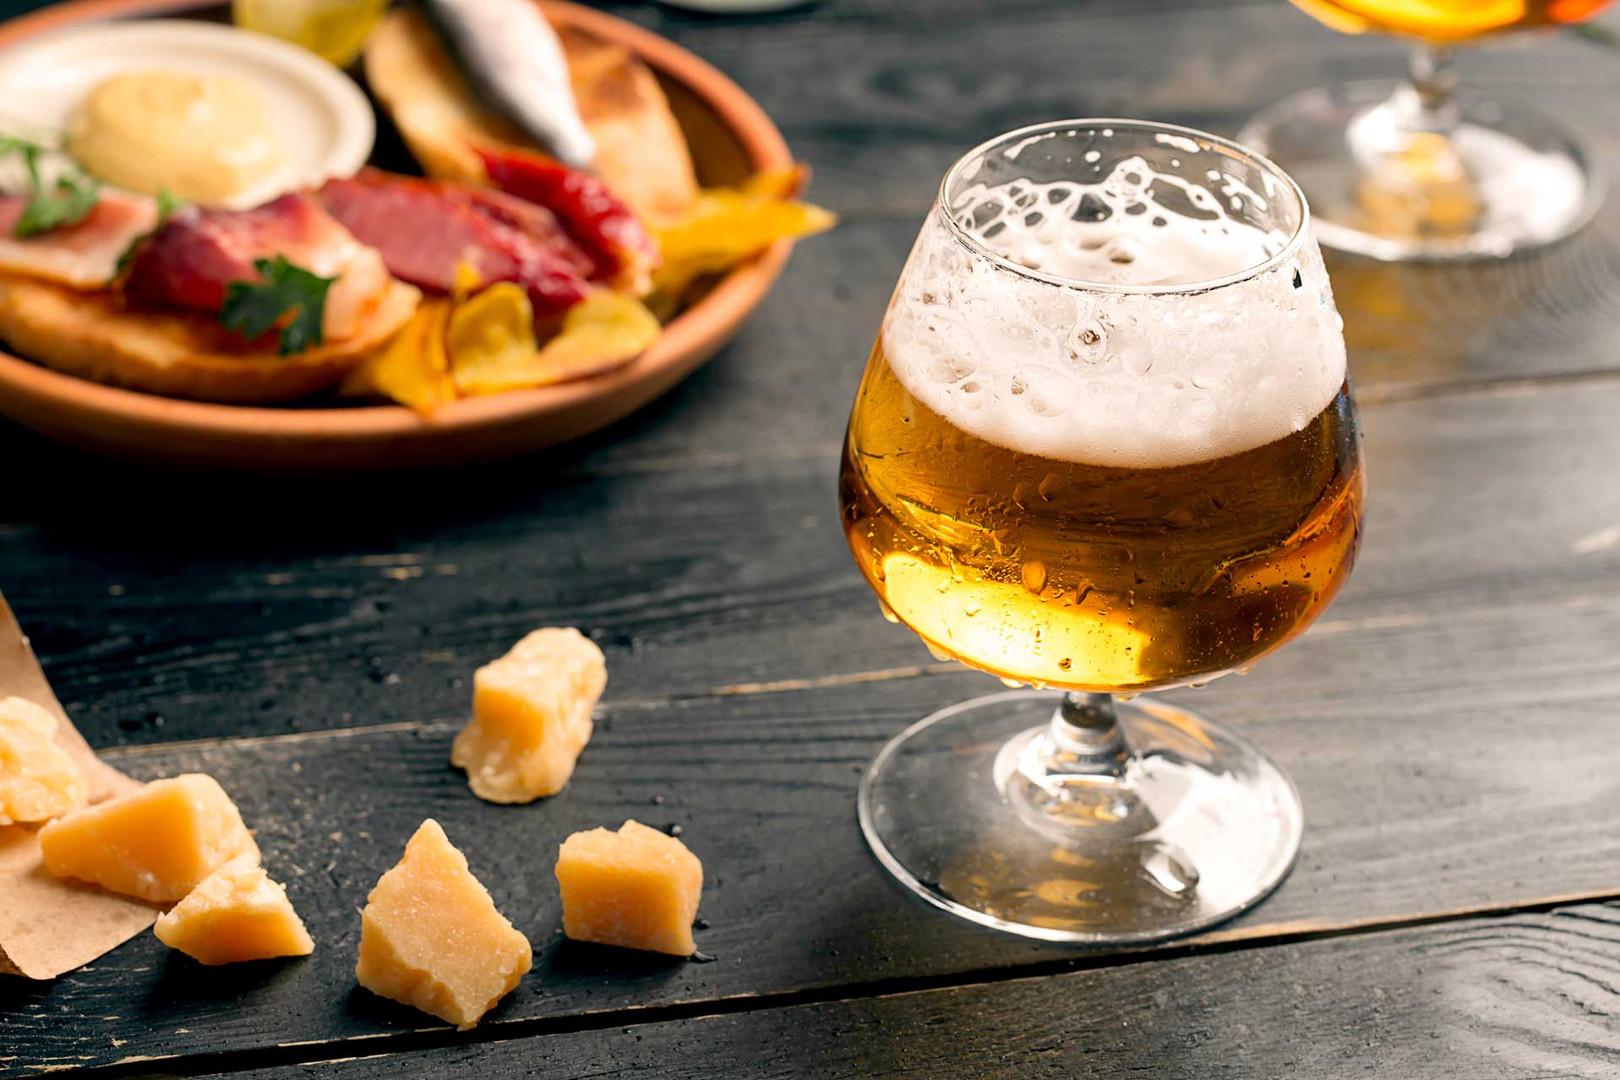 craft-beer-tour-food-pairing-ilovemycity